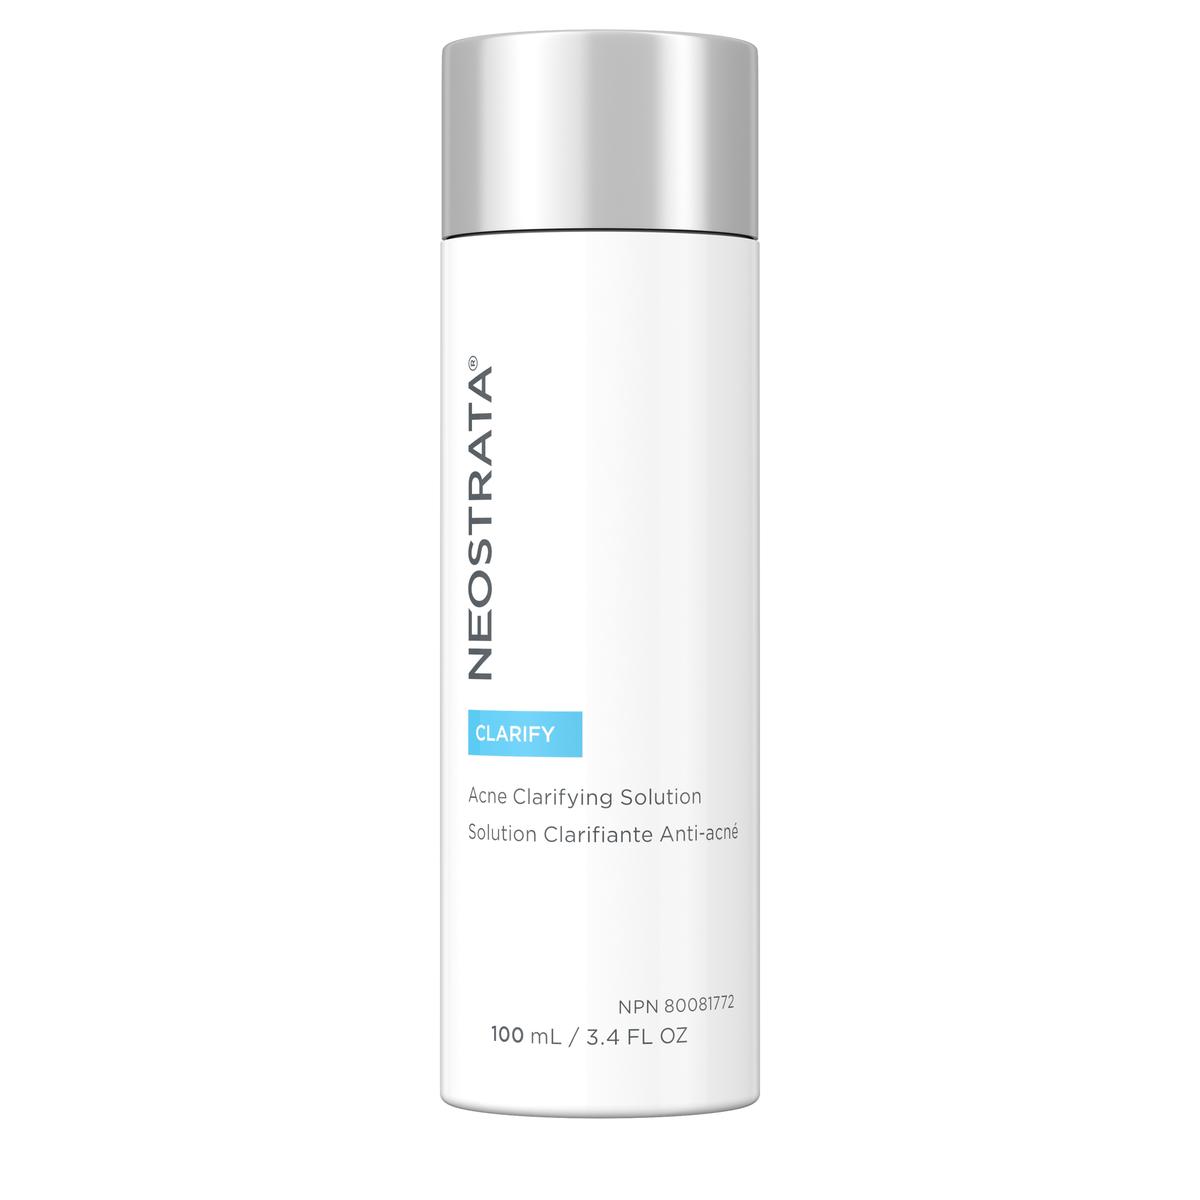 NEOSTRATA Acne Clarifying Solution